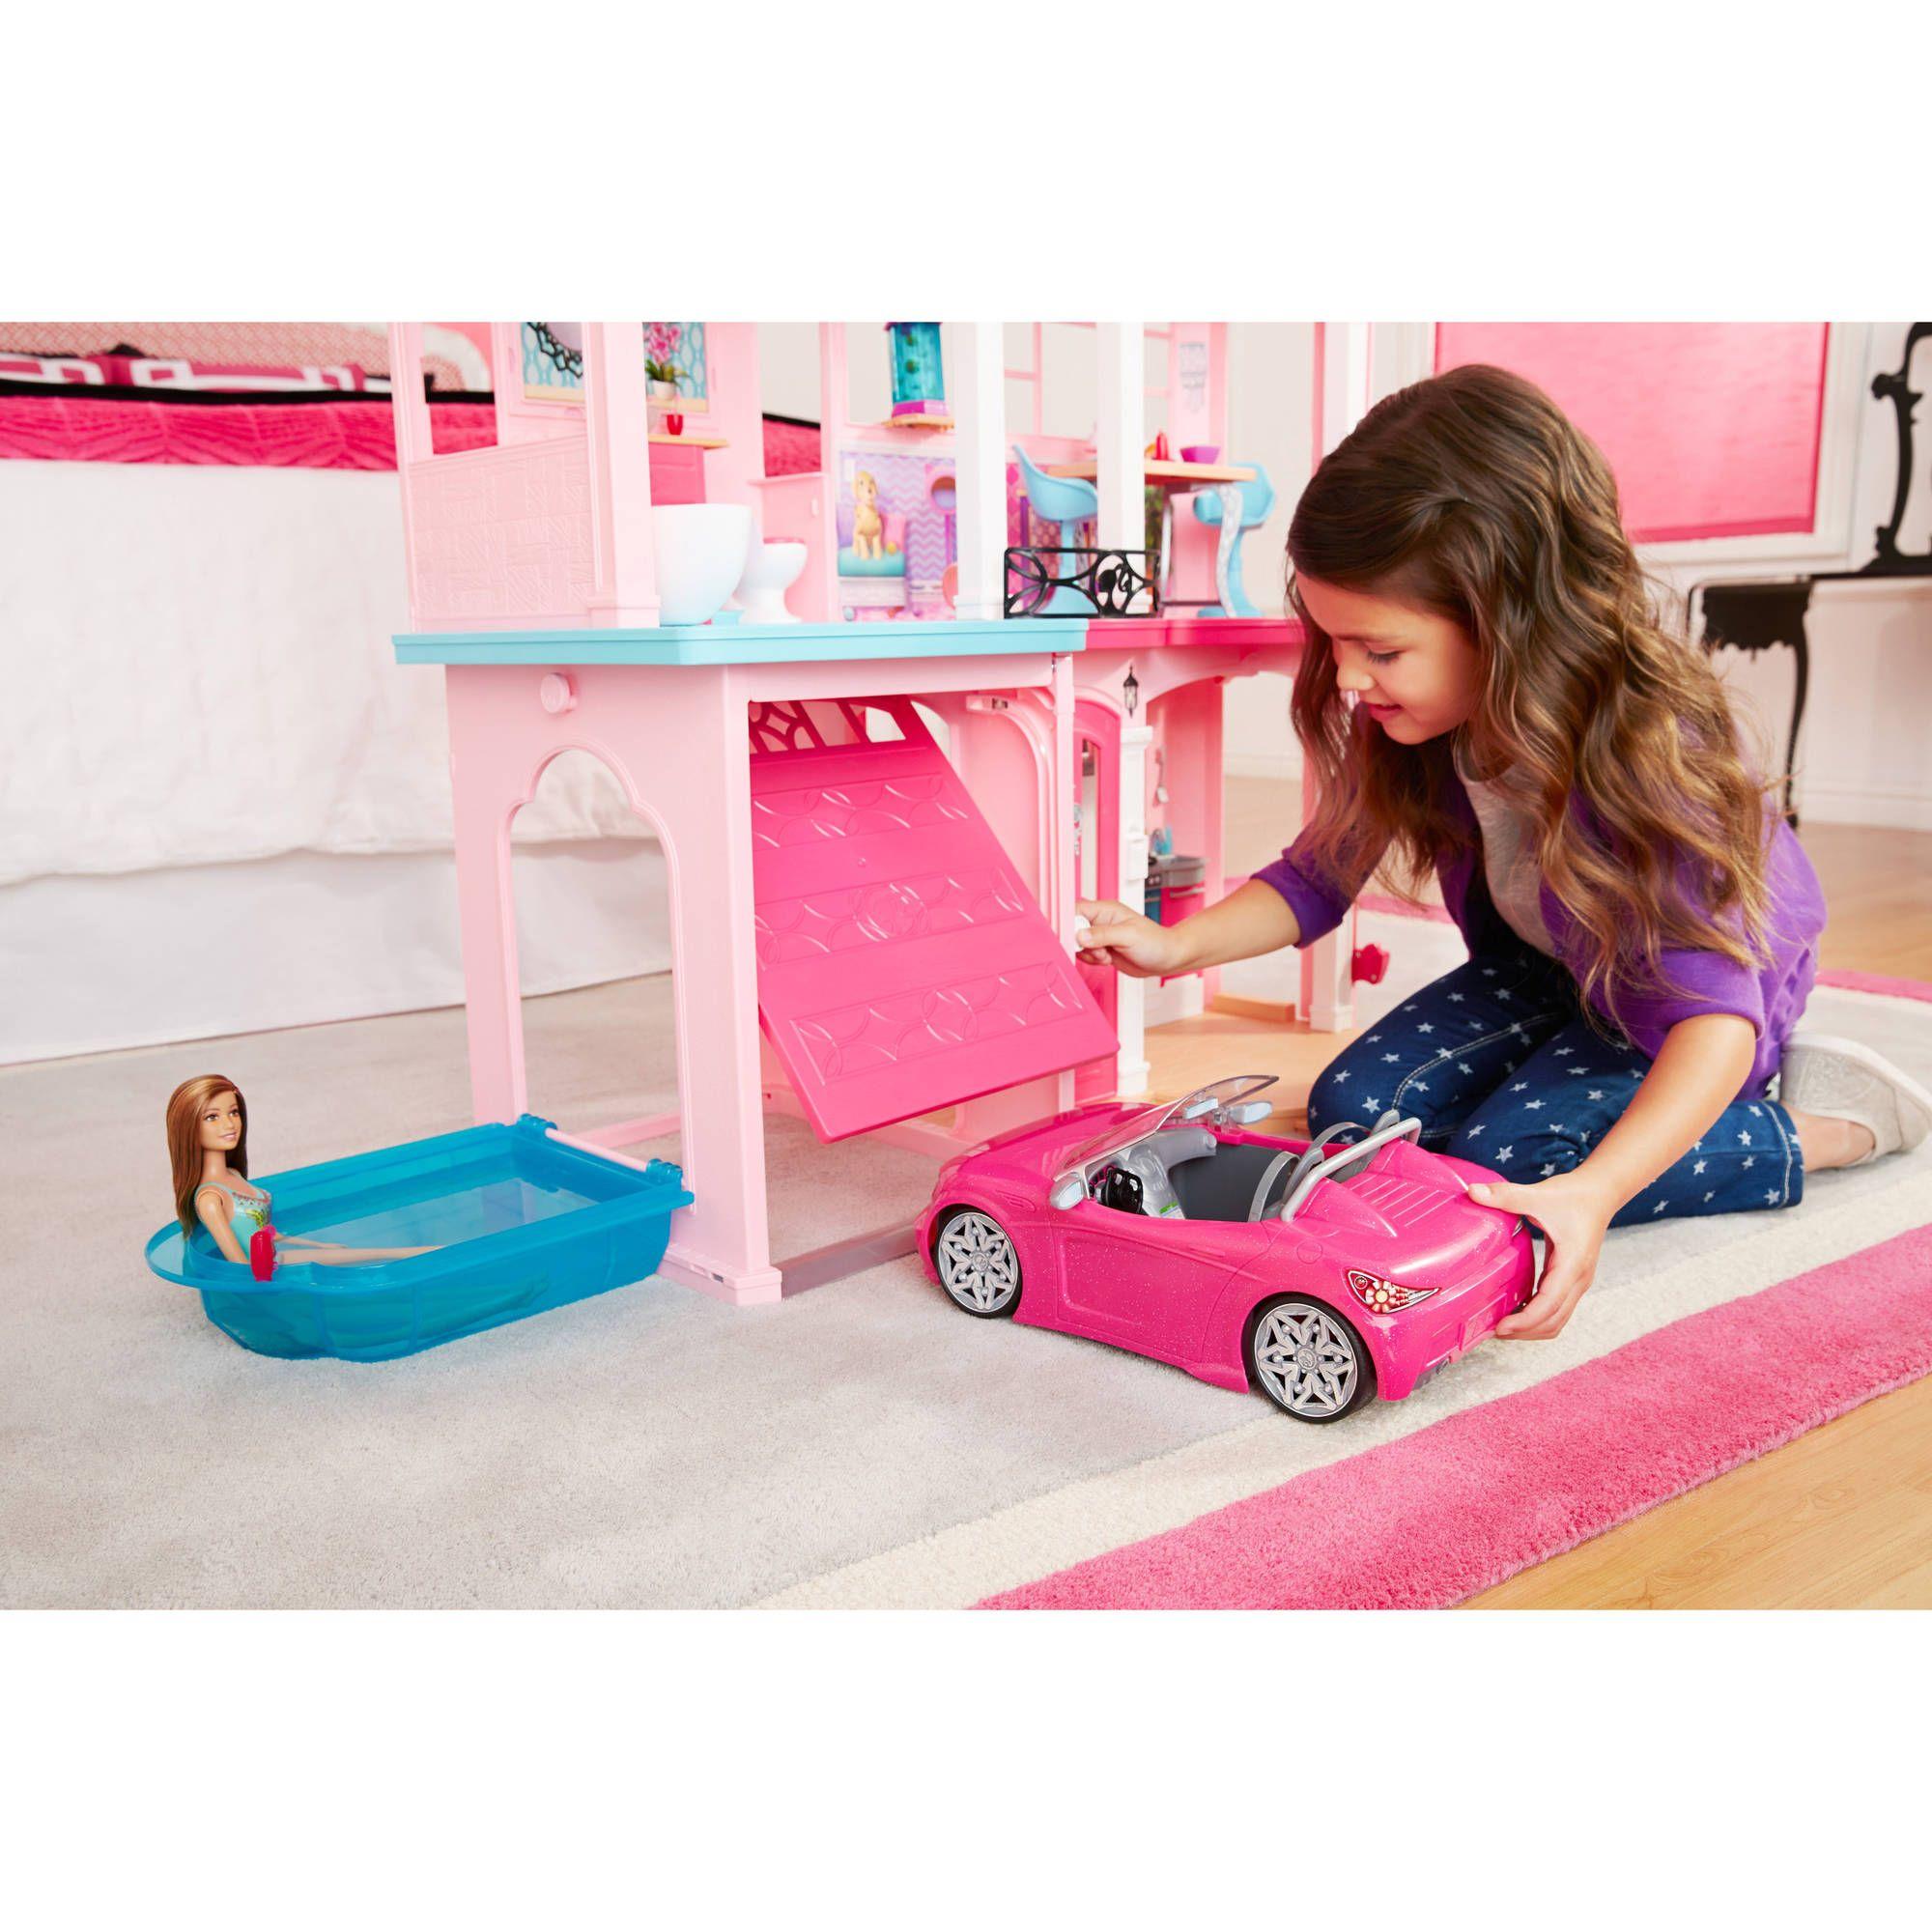 Barbie dreamhouse walmart com